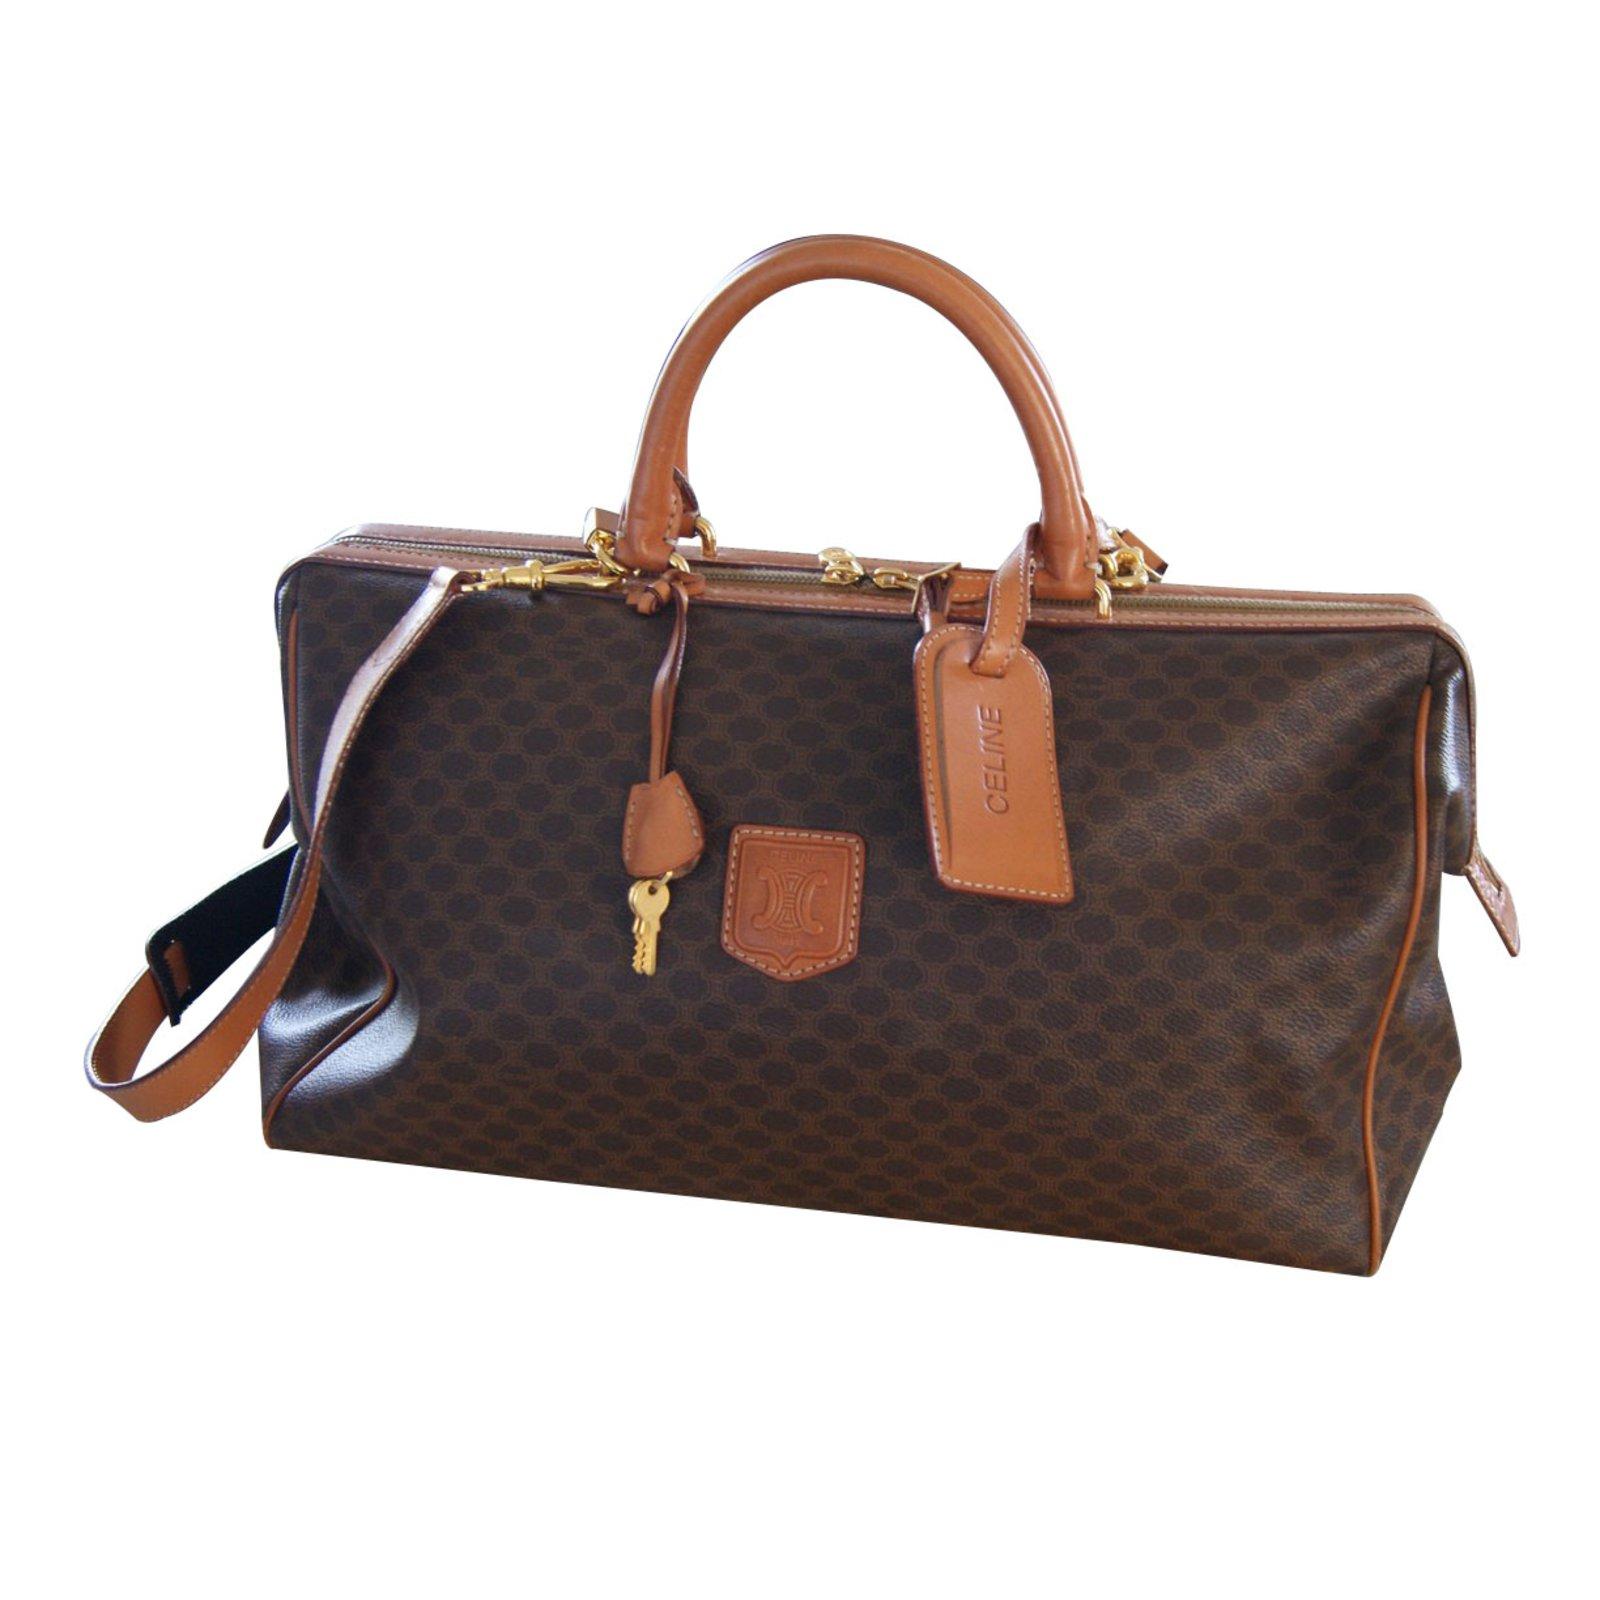 sacs de voyage c line doctor toile marron joli closet. Black Bedroom Furniture Sets. Home Design Ideas